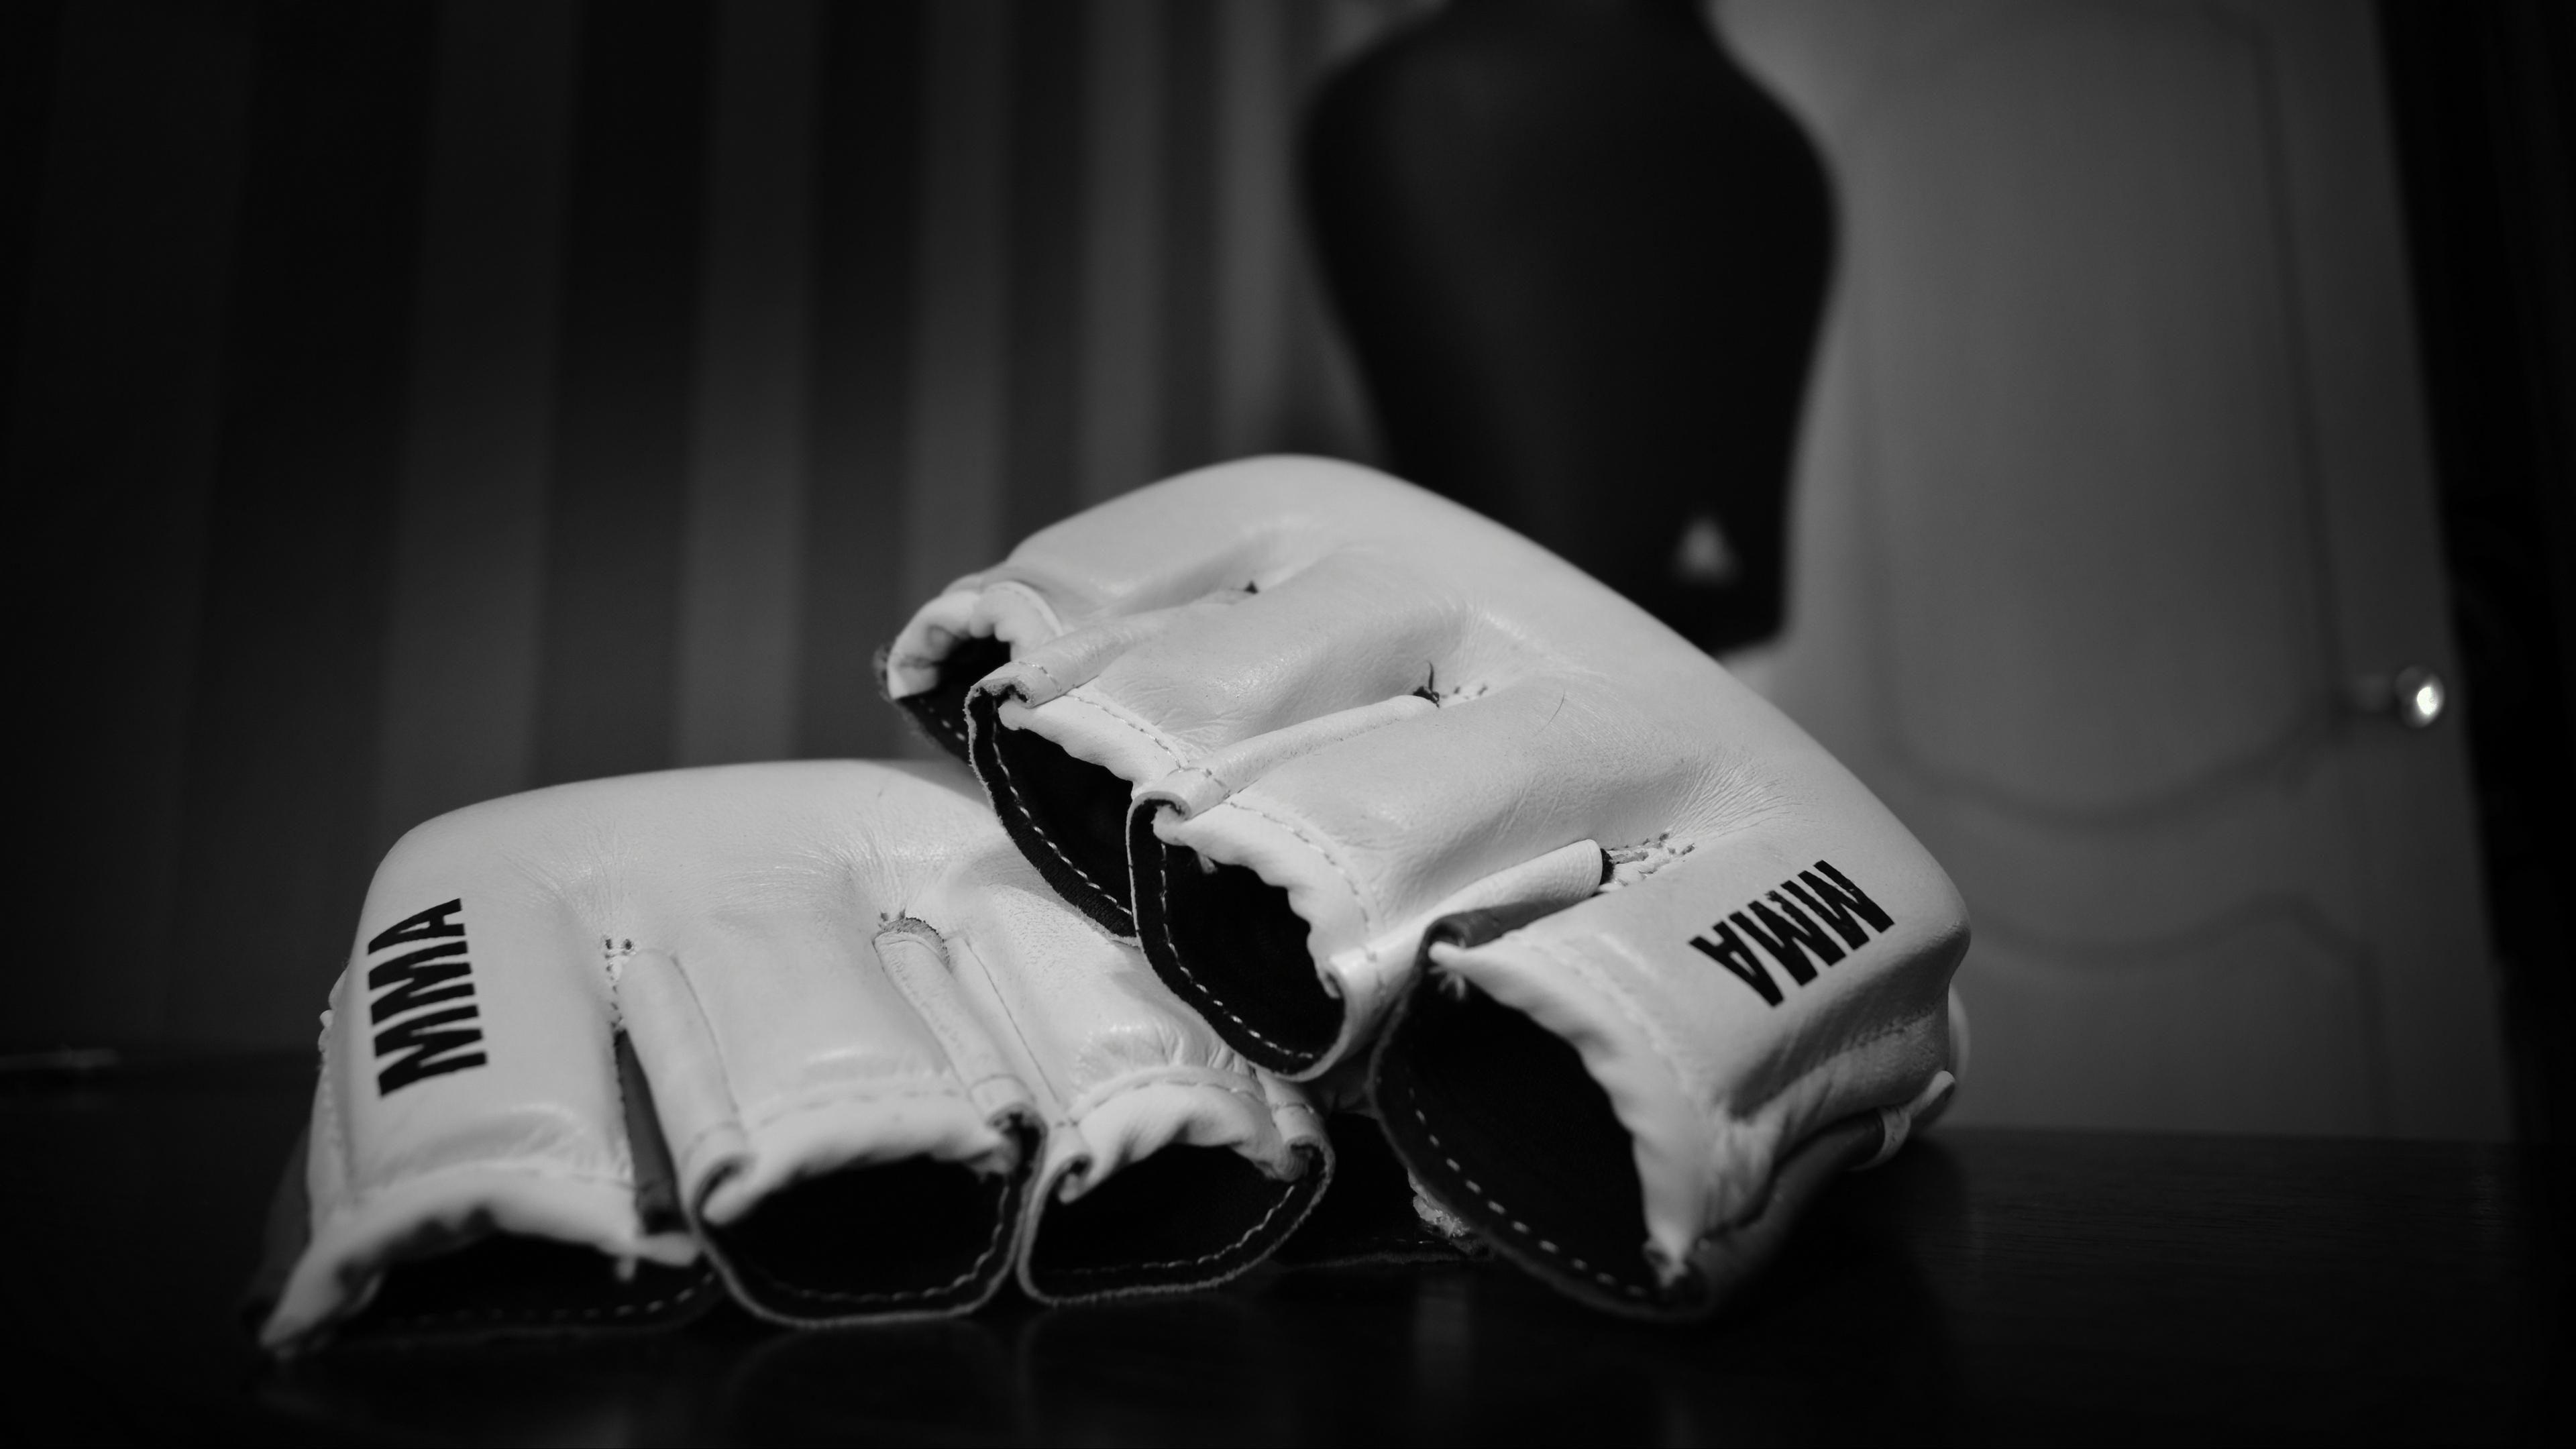 mixed martial arts mma wrestling bw gloves 4k 1540062602 - mixed martial arts, mma, wrestling, bw, gloves 4k - wrestling, mma, mixed martial arts